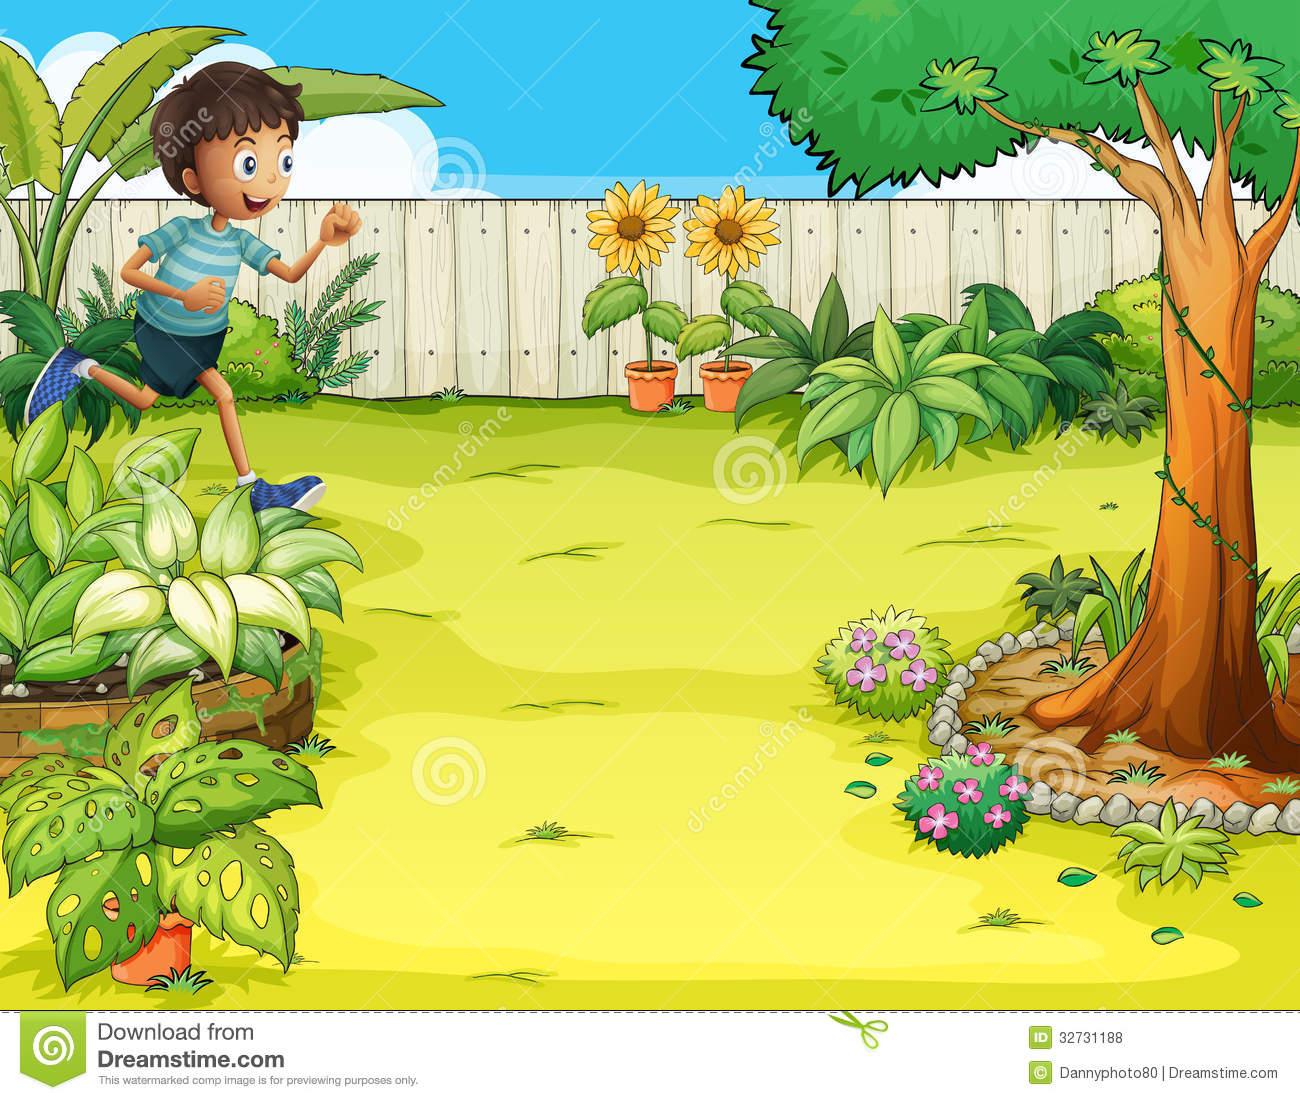 backyard clipart clipart panda free clipart images rh clipartpanda com backyard bbq clipart free backyard bbq clipart